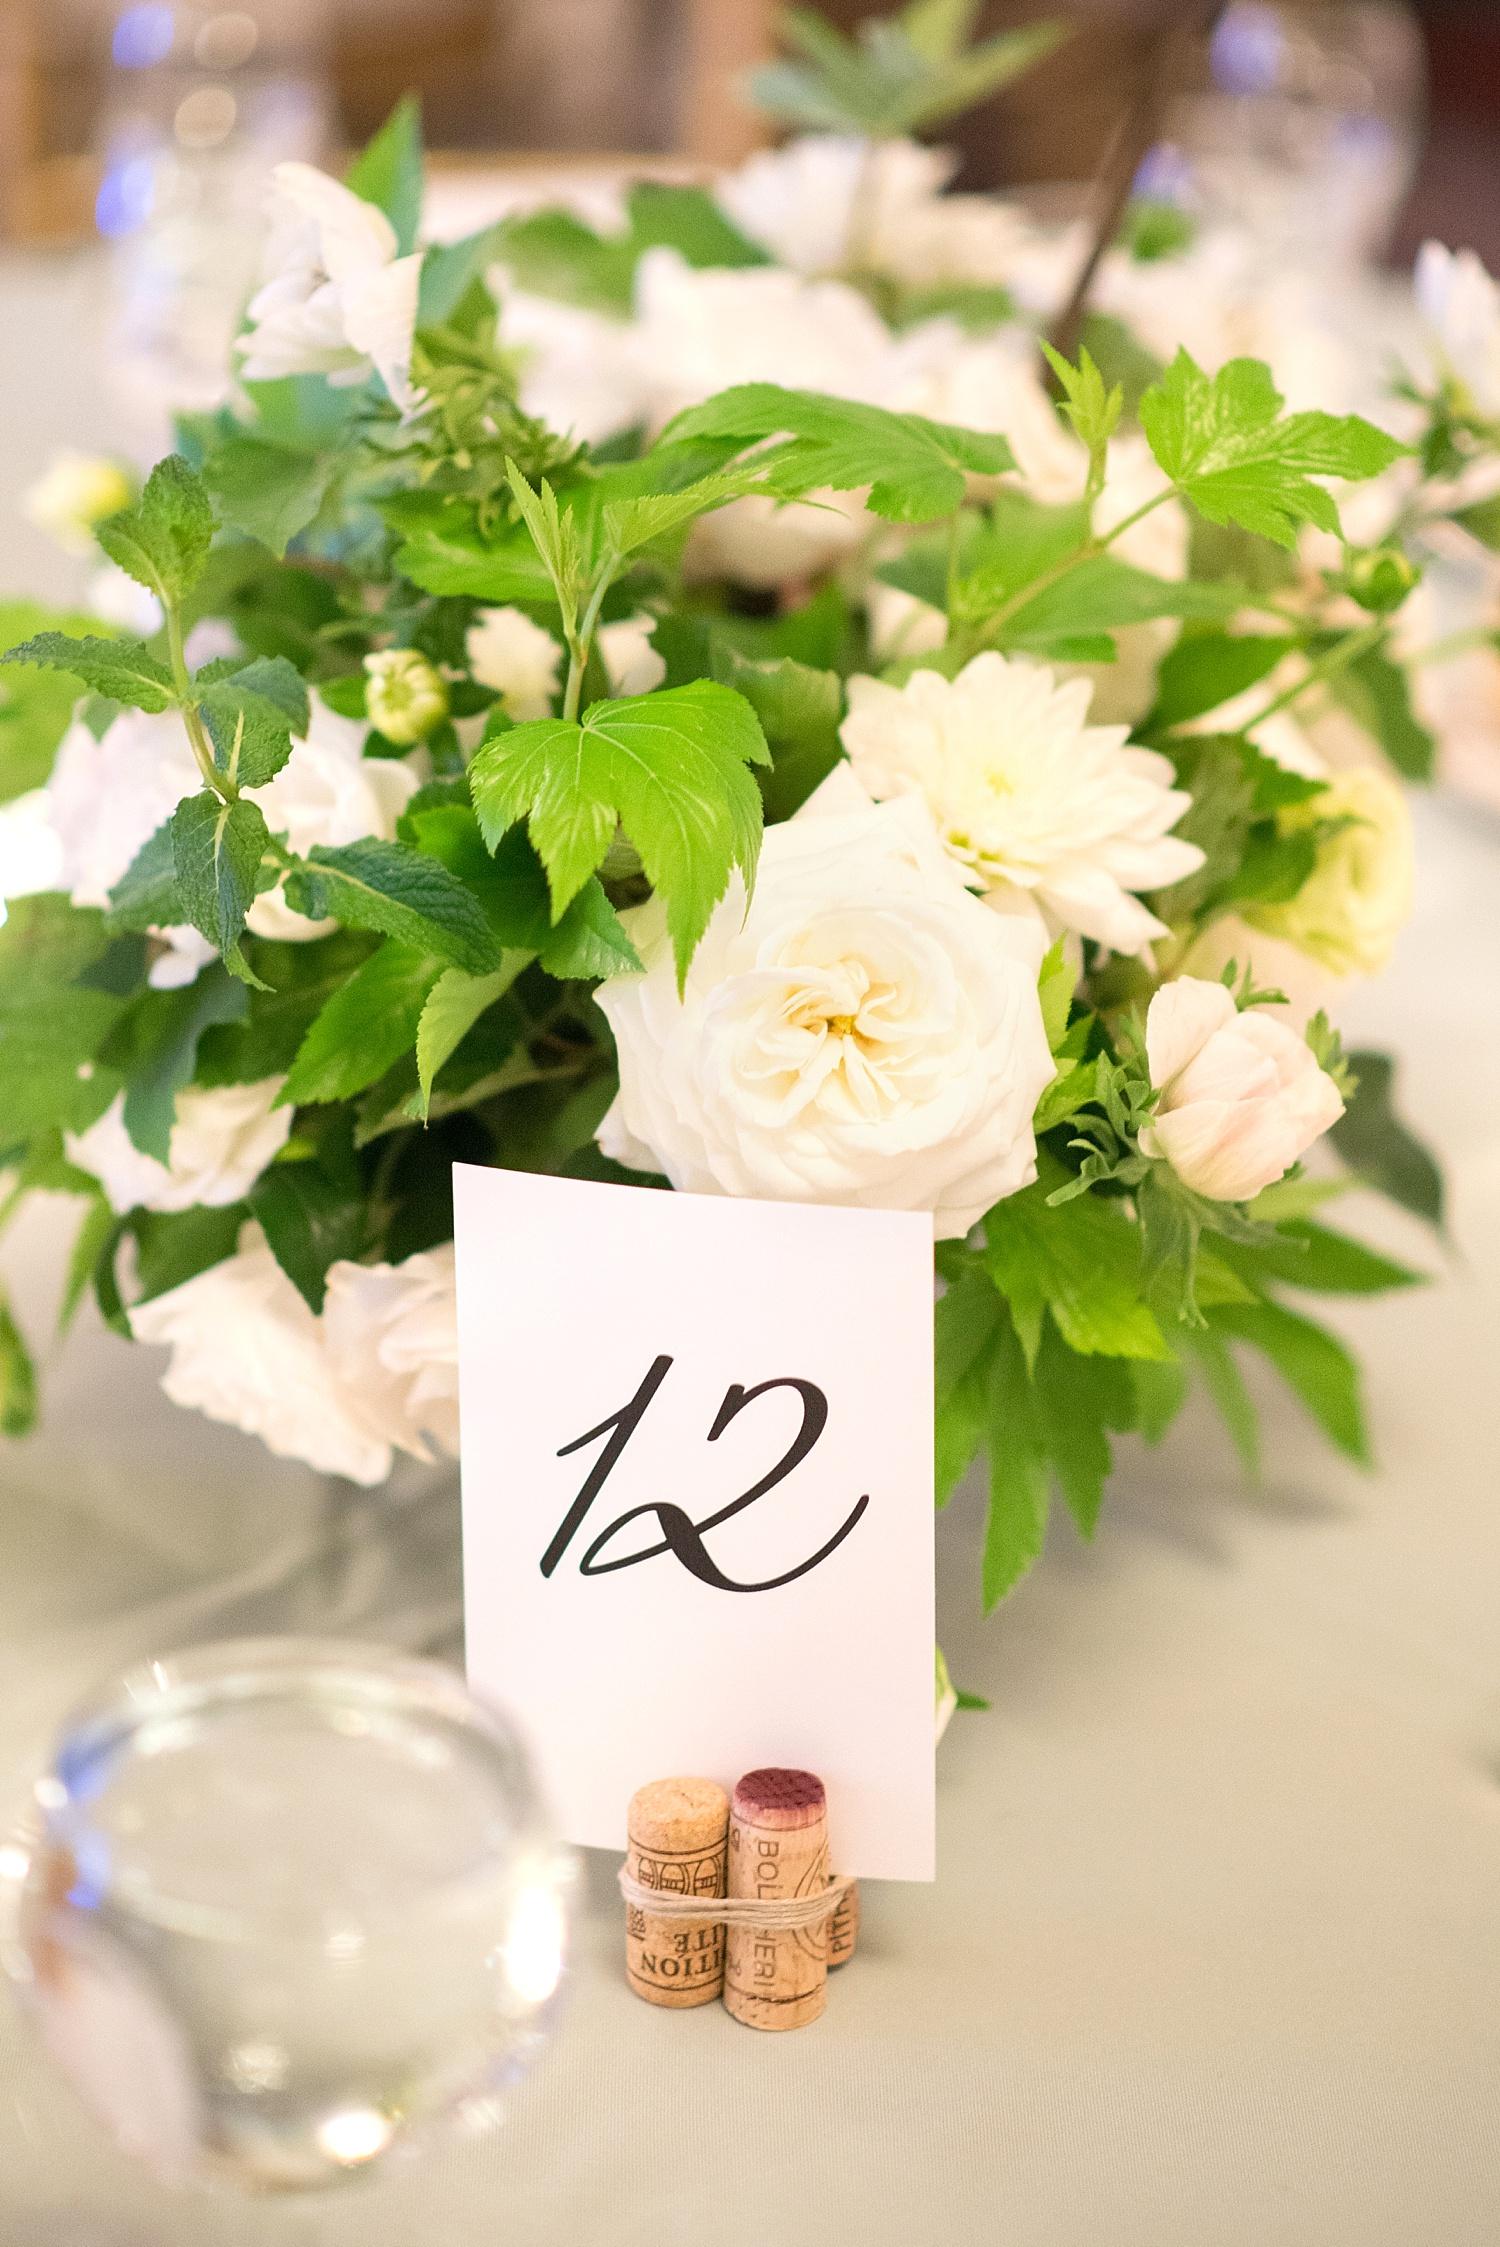 mikkelpaige-full_aperture_floral-pearl_river_hilton_wedding_0028.jpg